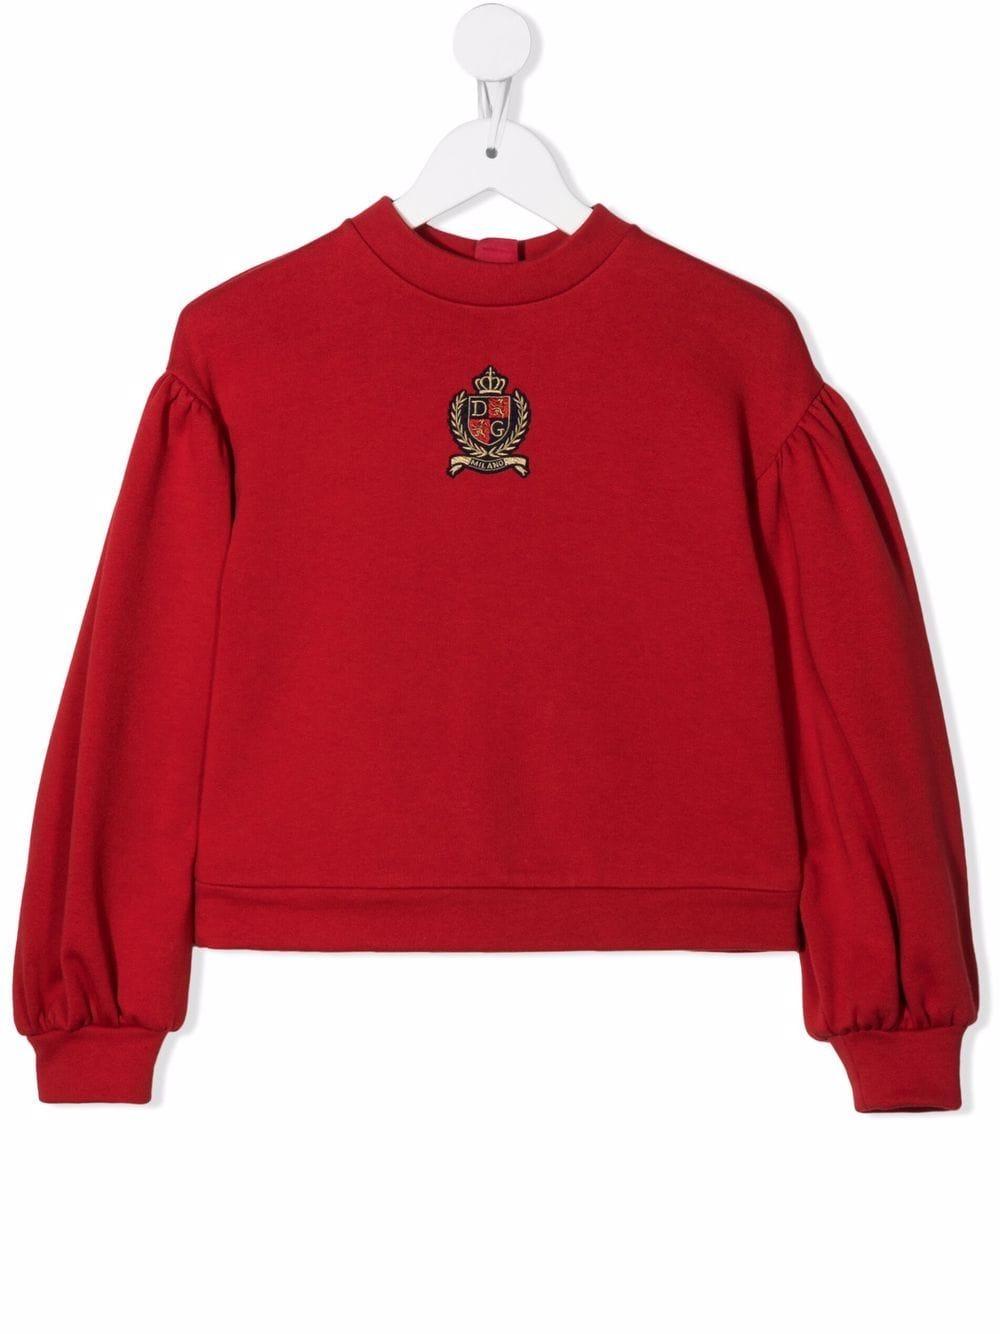 Felpa Dolce & Gabbana kids DOLCE&GABBANA KIDS | -108764232 | L5JW4YG7AYJR2254